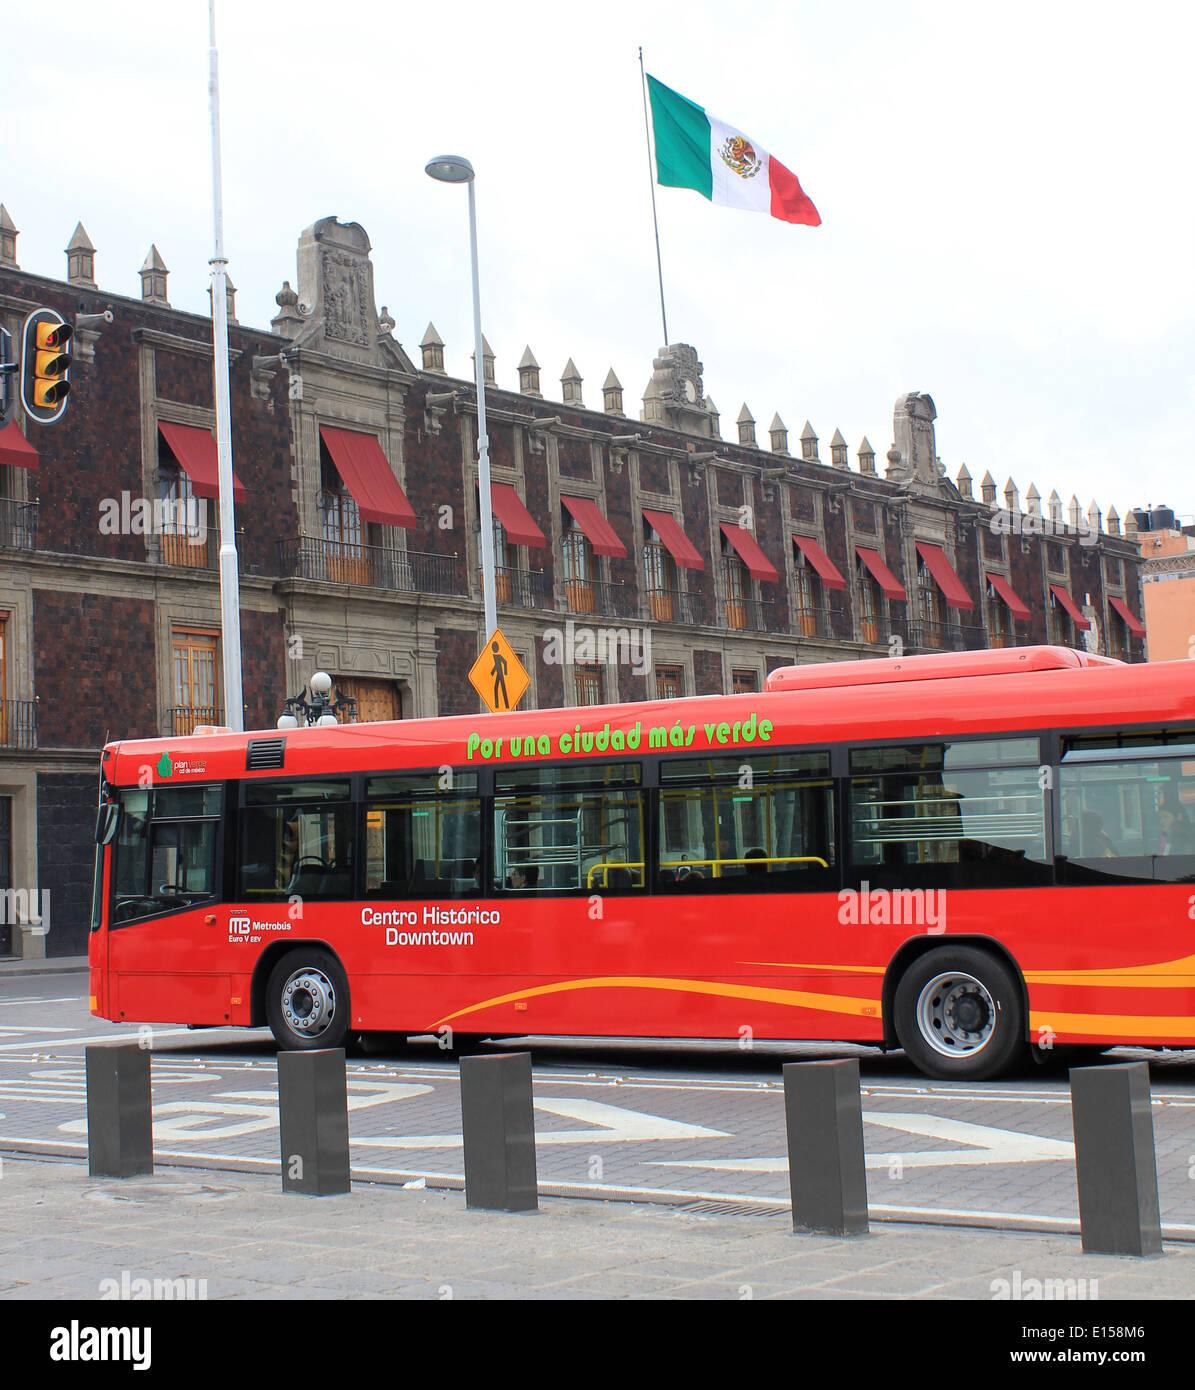 Transportation Public Transport Metrobus Stock Photos